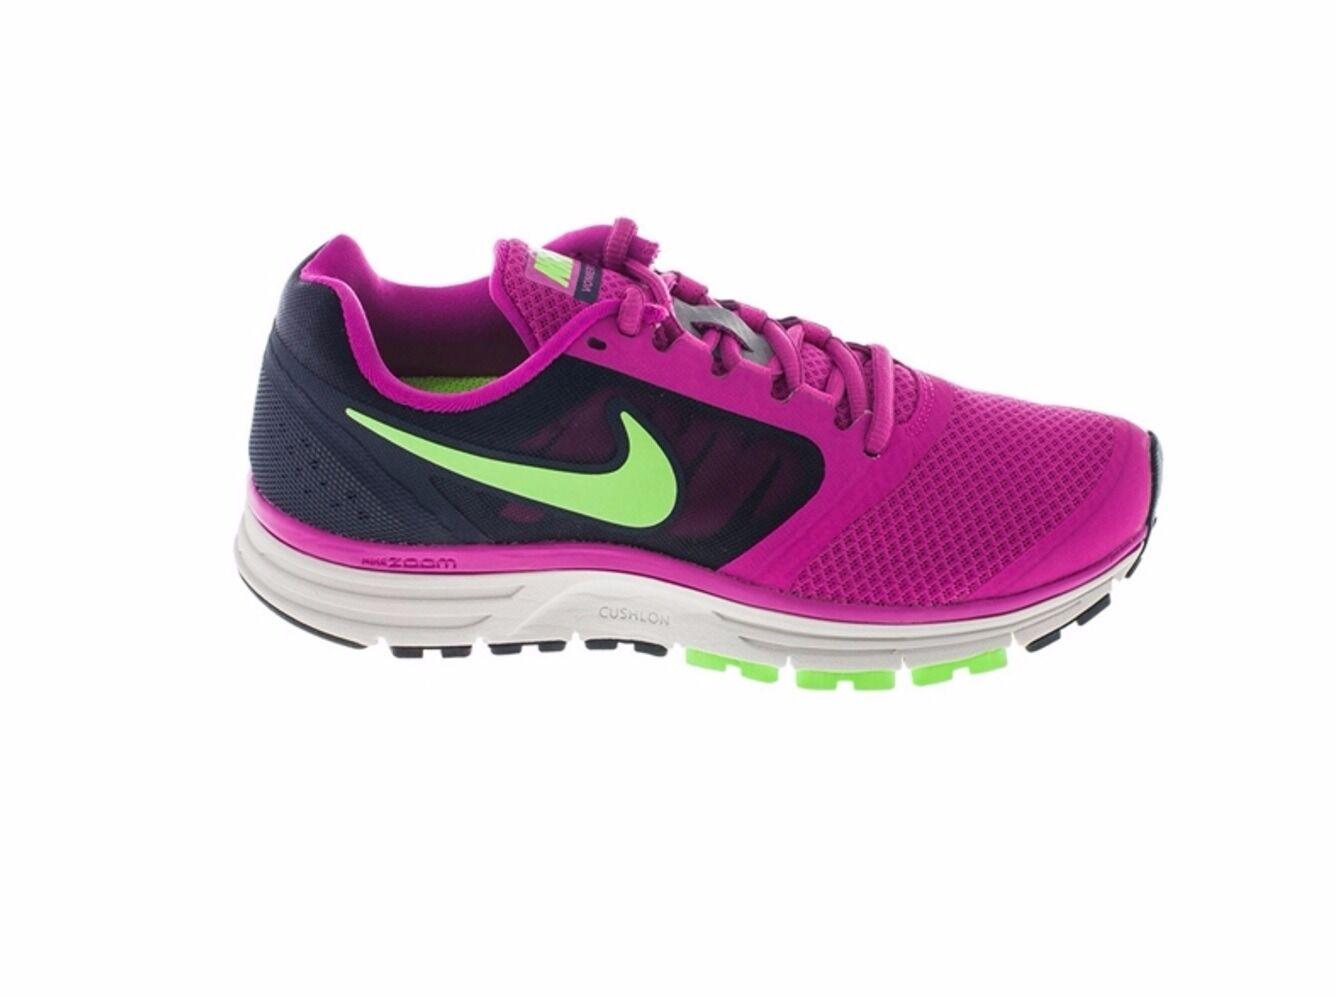 Nike - Damen Zoom Vomero+ 8 Größe 3 - 8 Turnschuhe Club rosa NEU